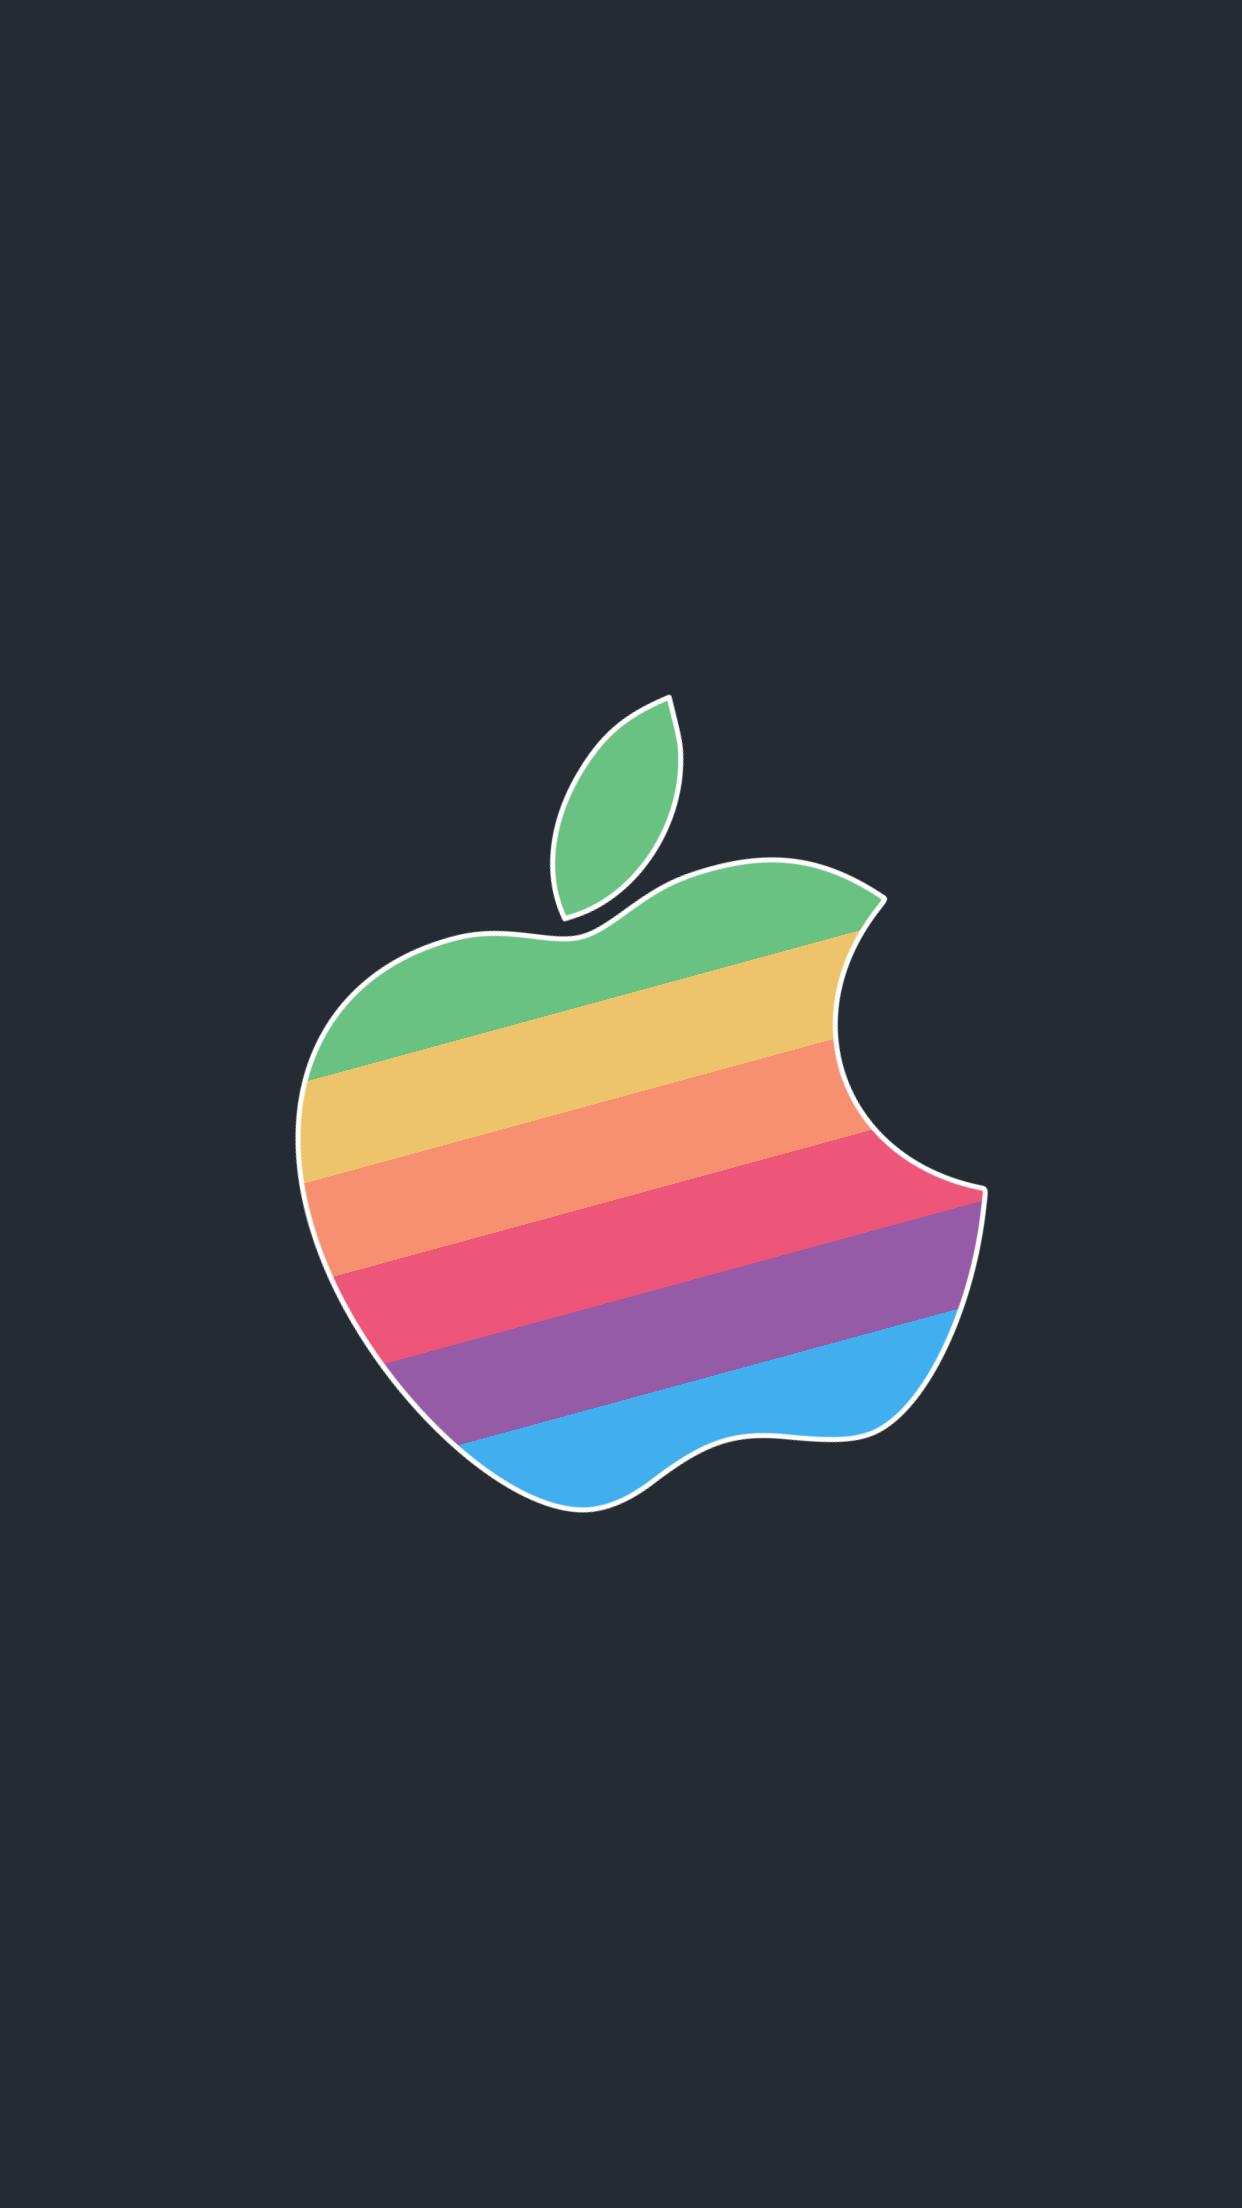 Wallpaper Apple Iphone Wallpaper Hd Apple Logo Wallpaper Iphone Apple Logo Wallpaper